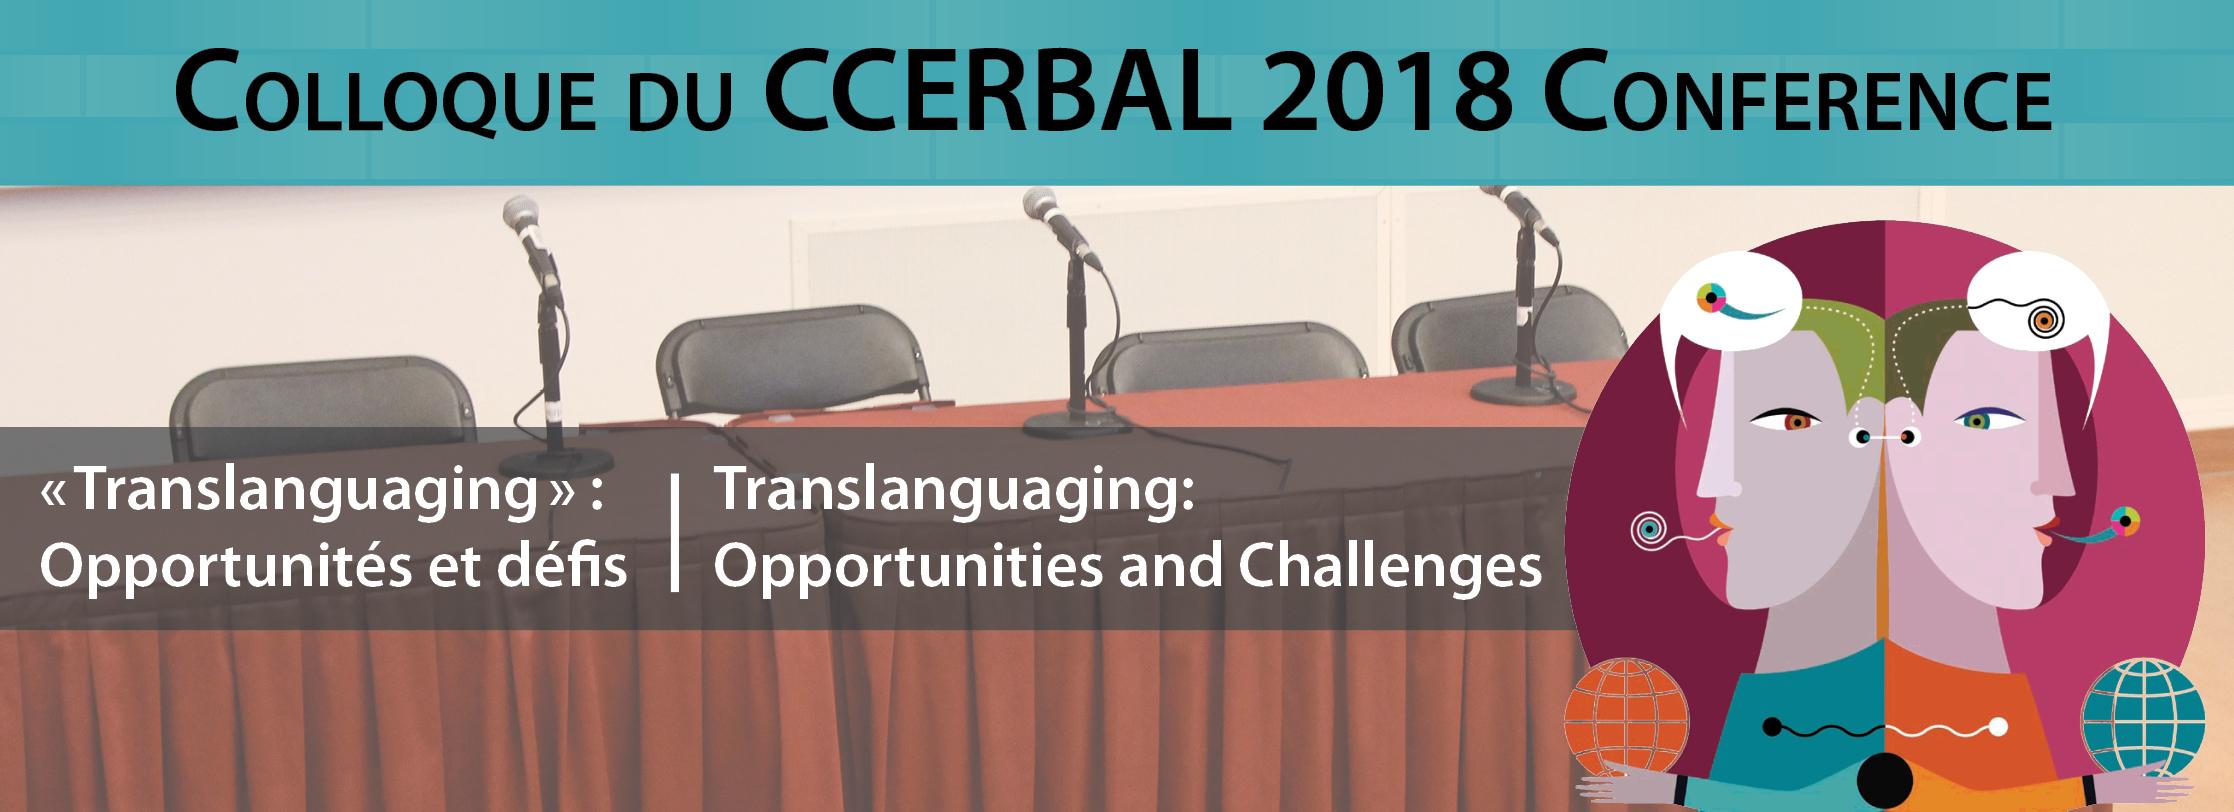 ccerbal_colloque_2018_bil_web_banner_v2